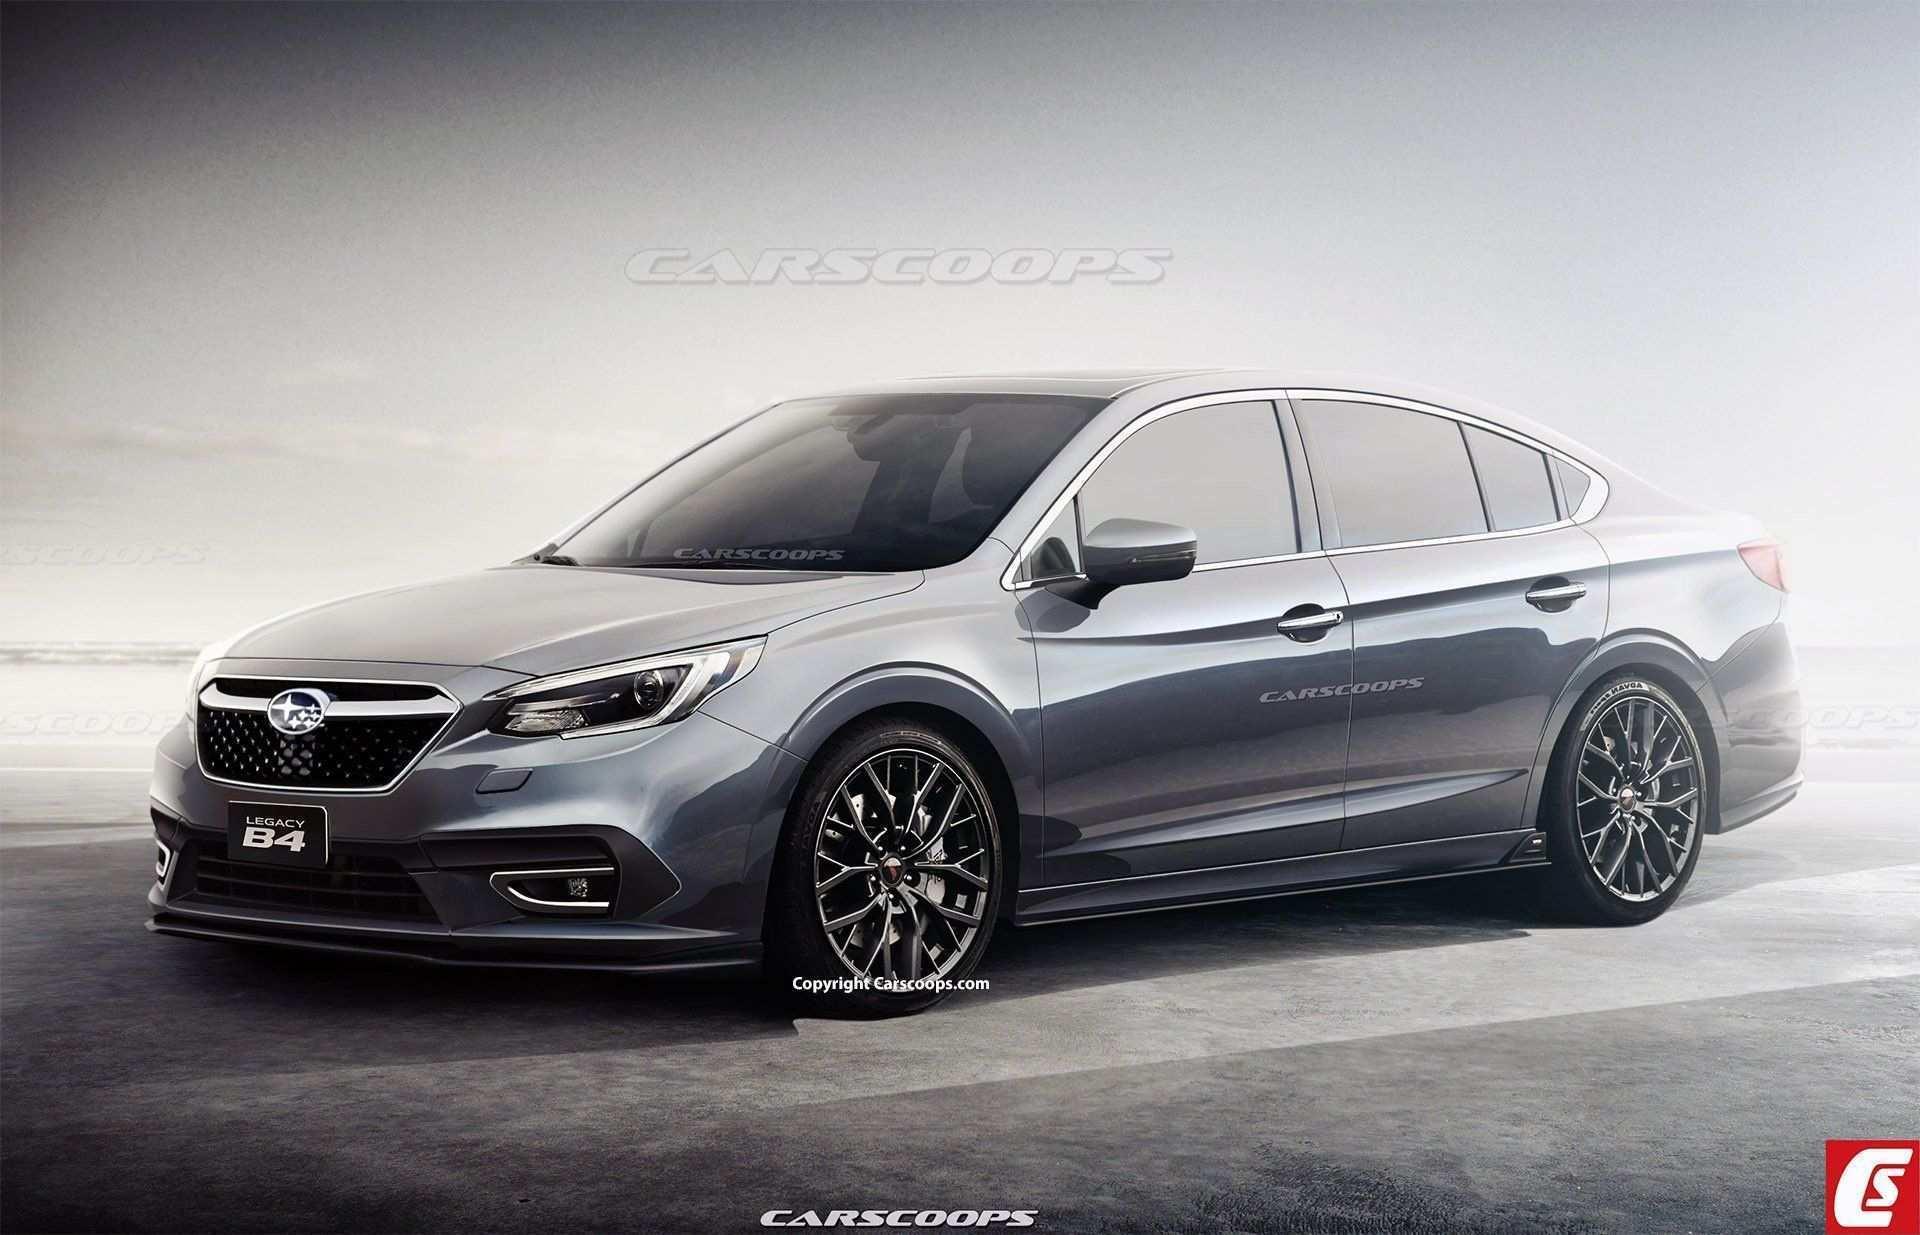 72 Gallery of Subaru Brat 2020 Prices for Subaru Brat 2020